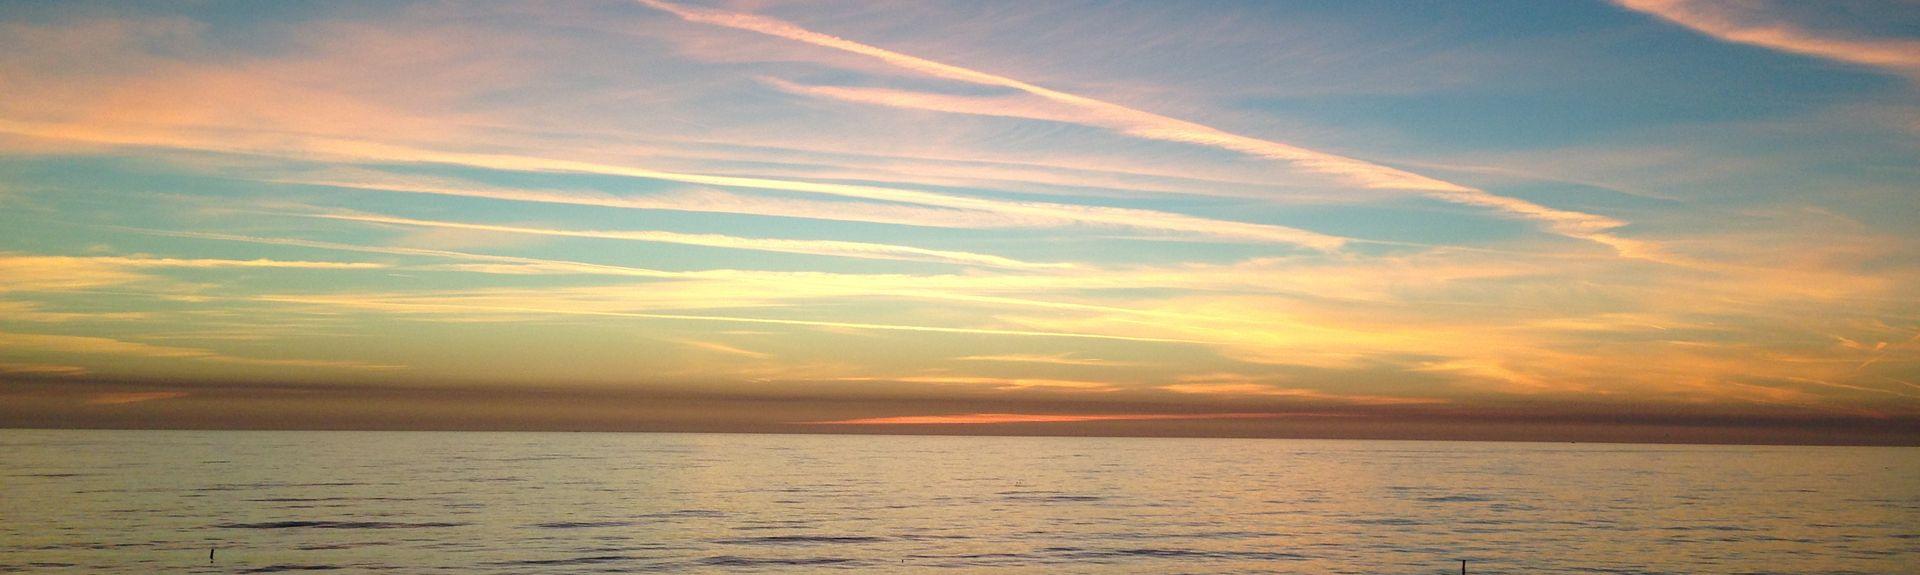 Sea Rocket, North Redington Beach, Florida, United States